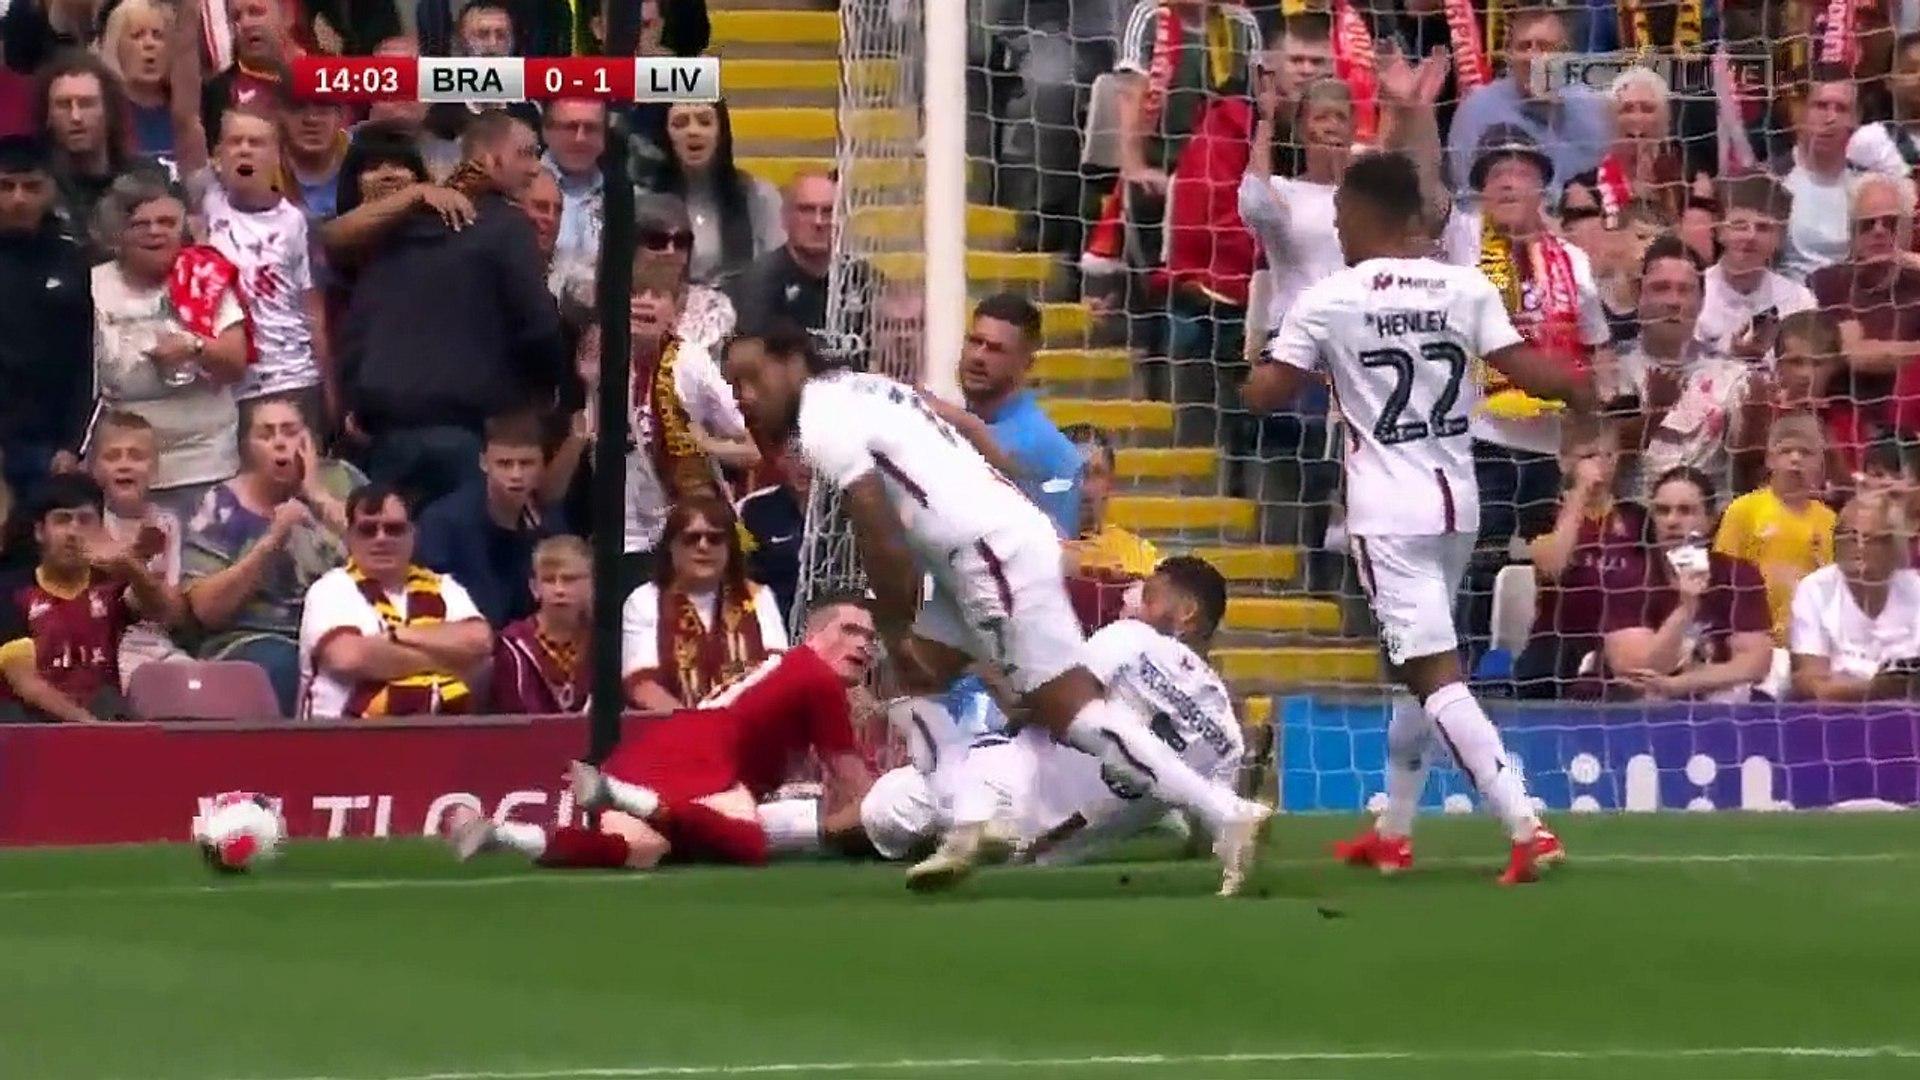 Bradford City vs Liverpool  All Goals and Highlights 720 x 1280